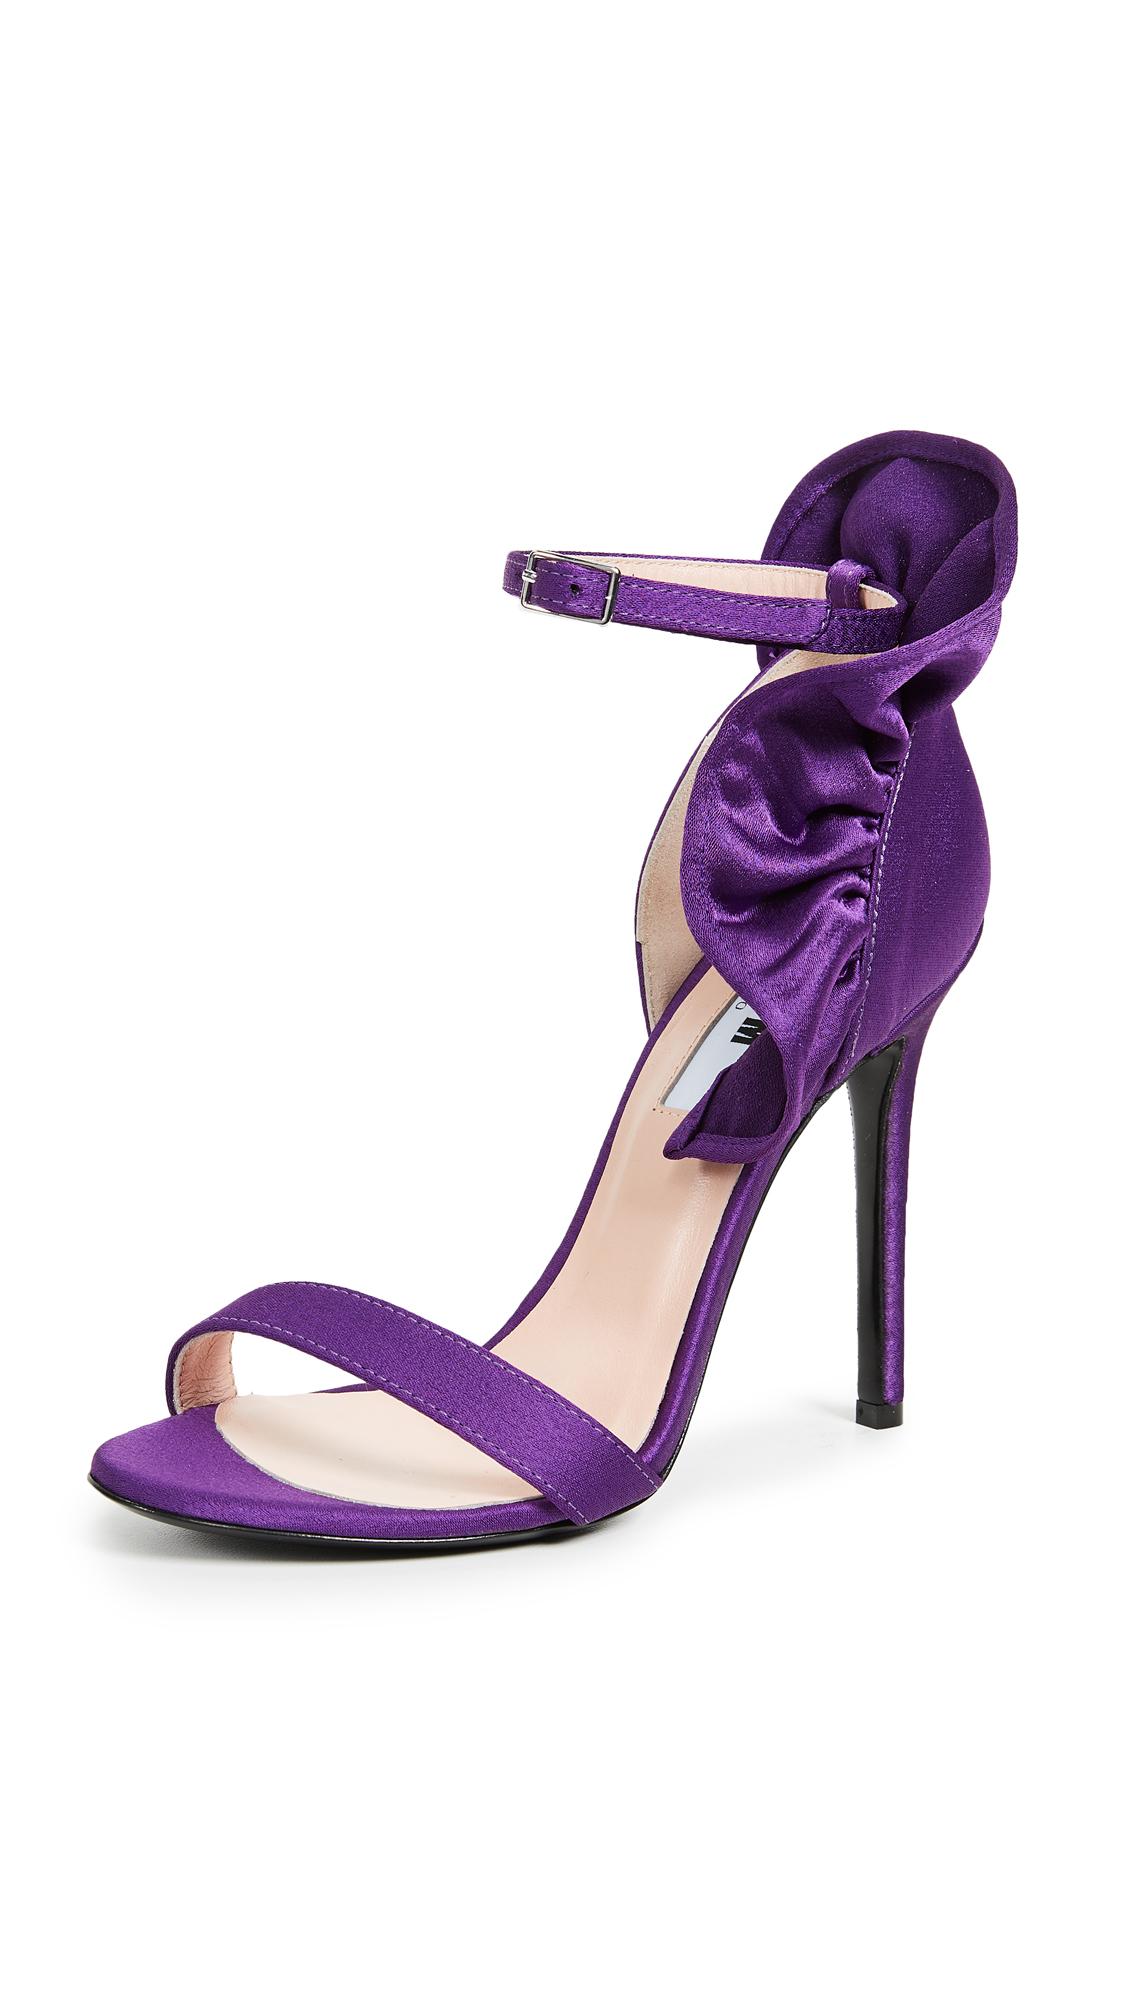 MSGM Rouche Sandals - Purple